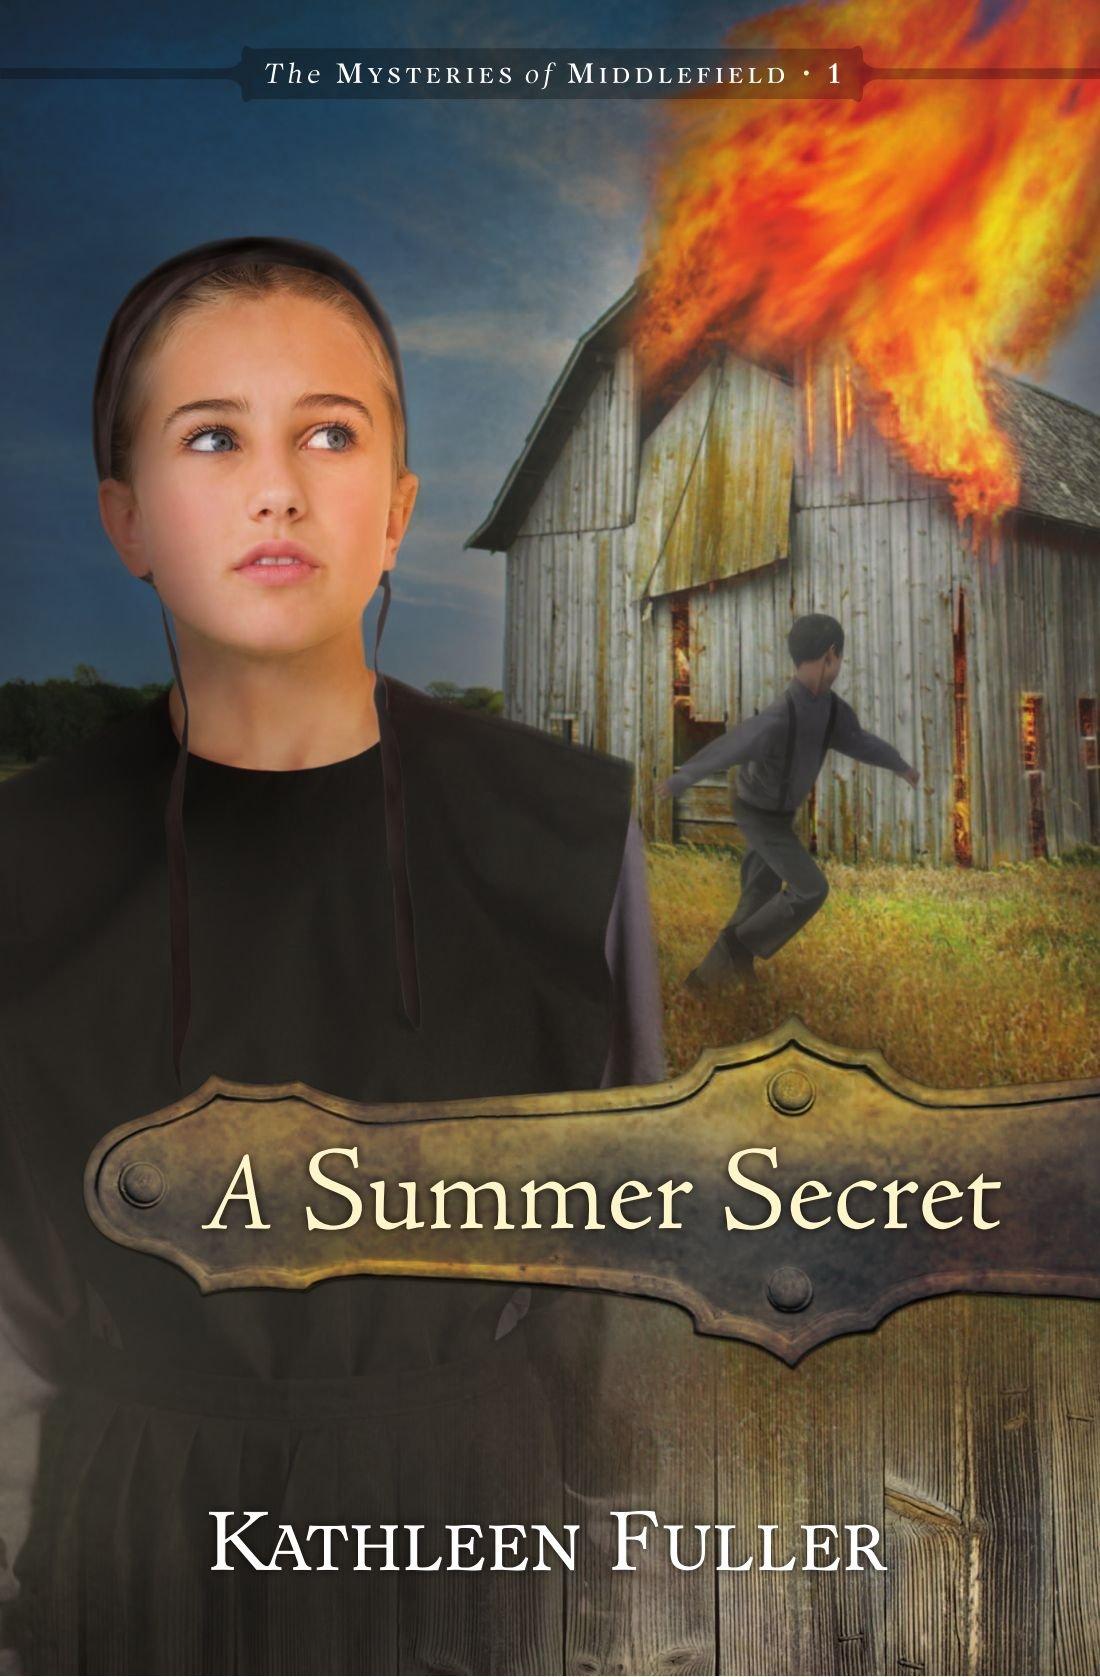 A Summer Secret (The Mysteries of Middlefield Series) ebook